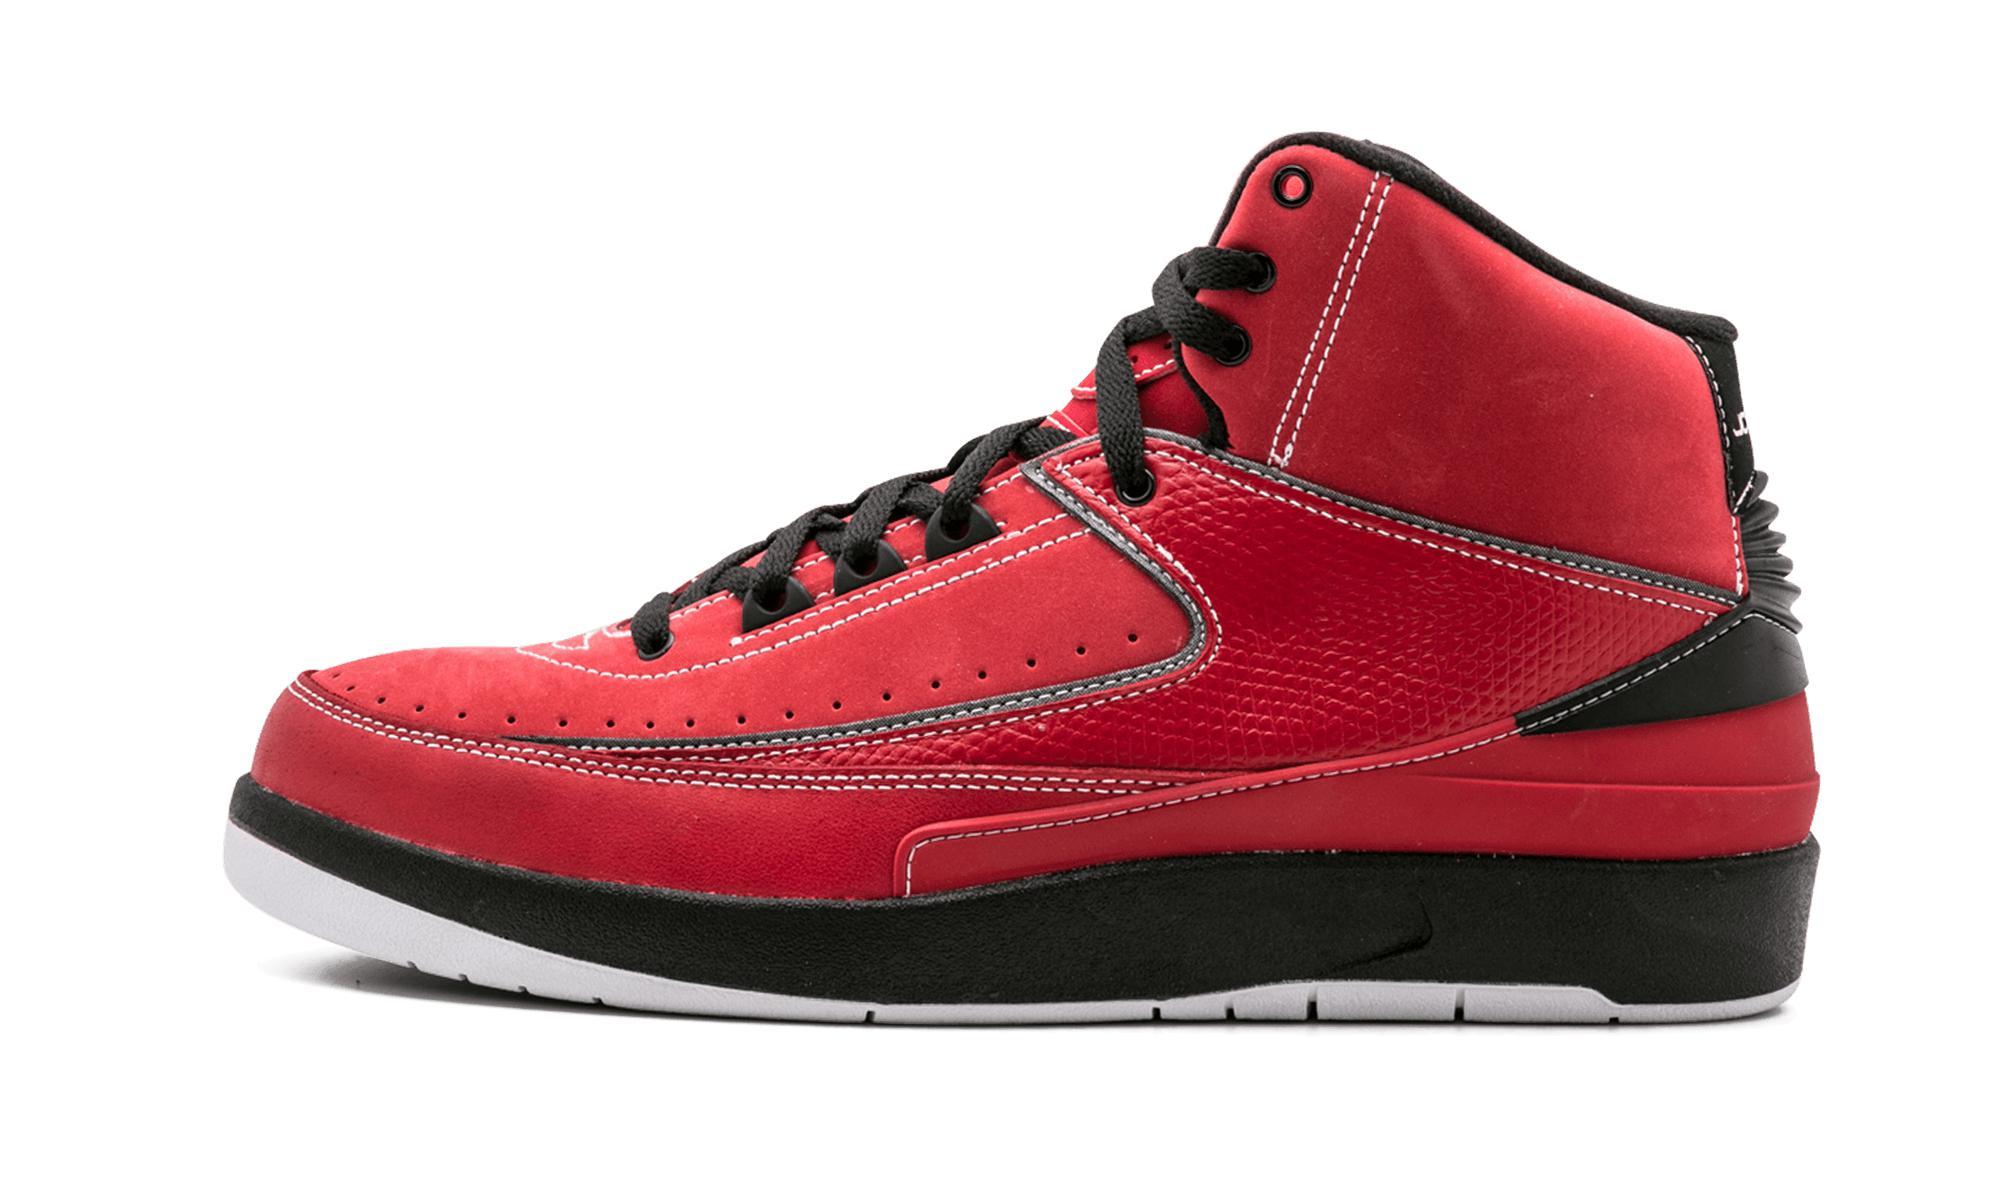 05e27dd5e5e3 Lyst - Nike Air 2 Retro Qf in Red for Men - Save 10%